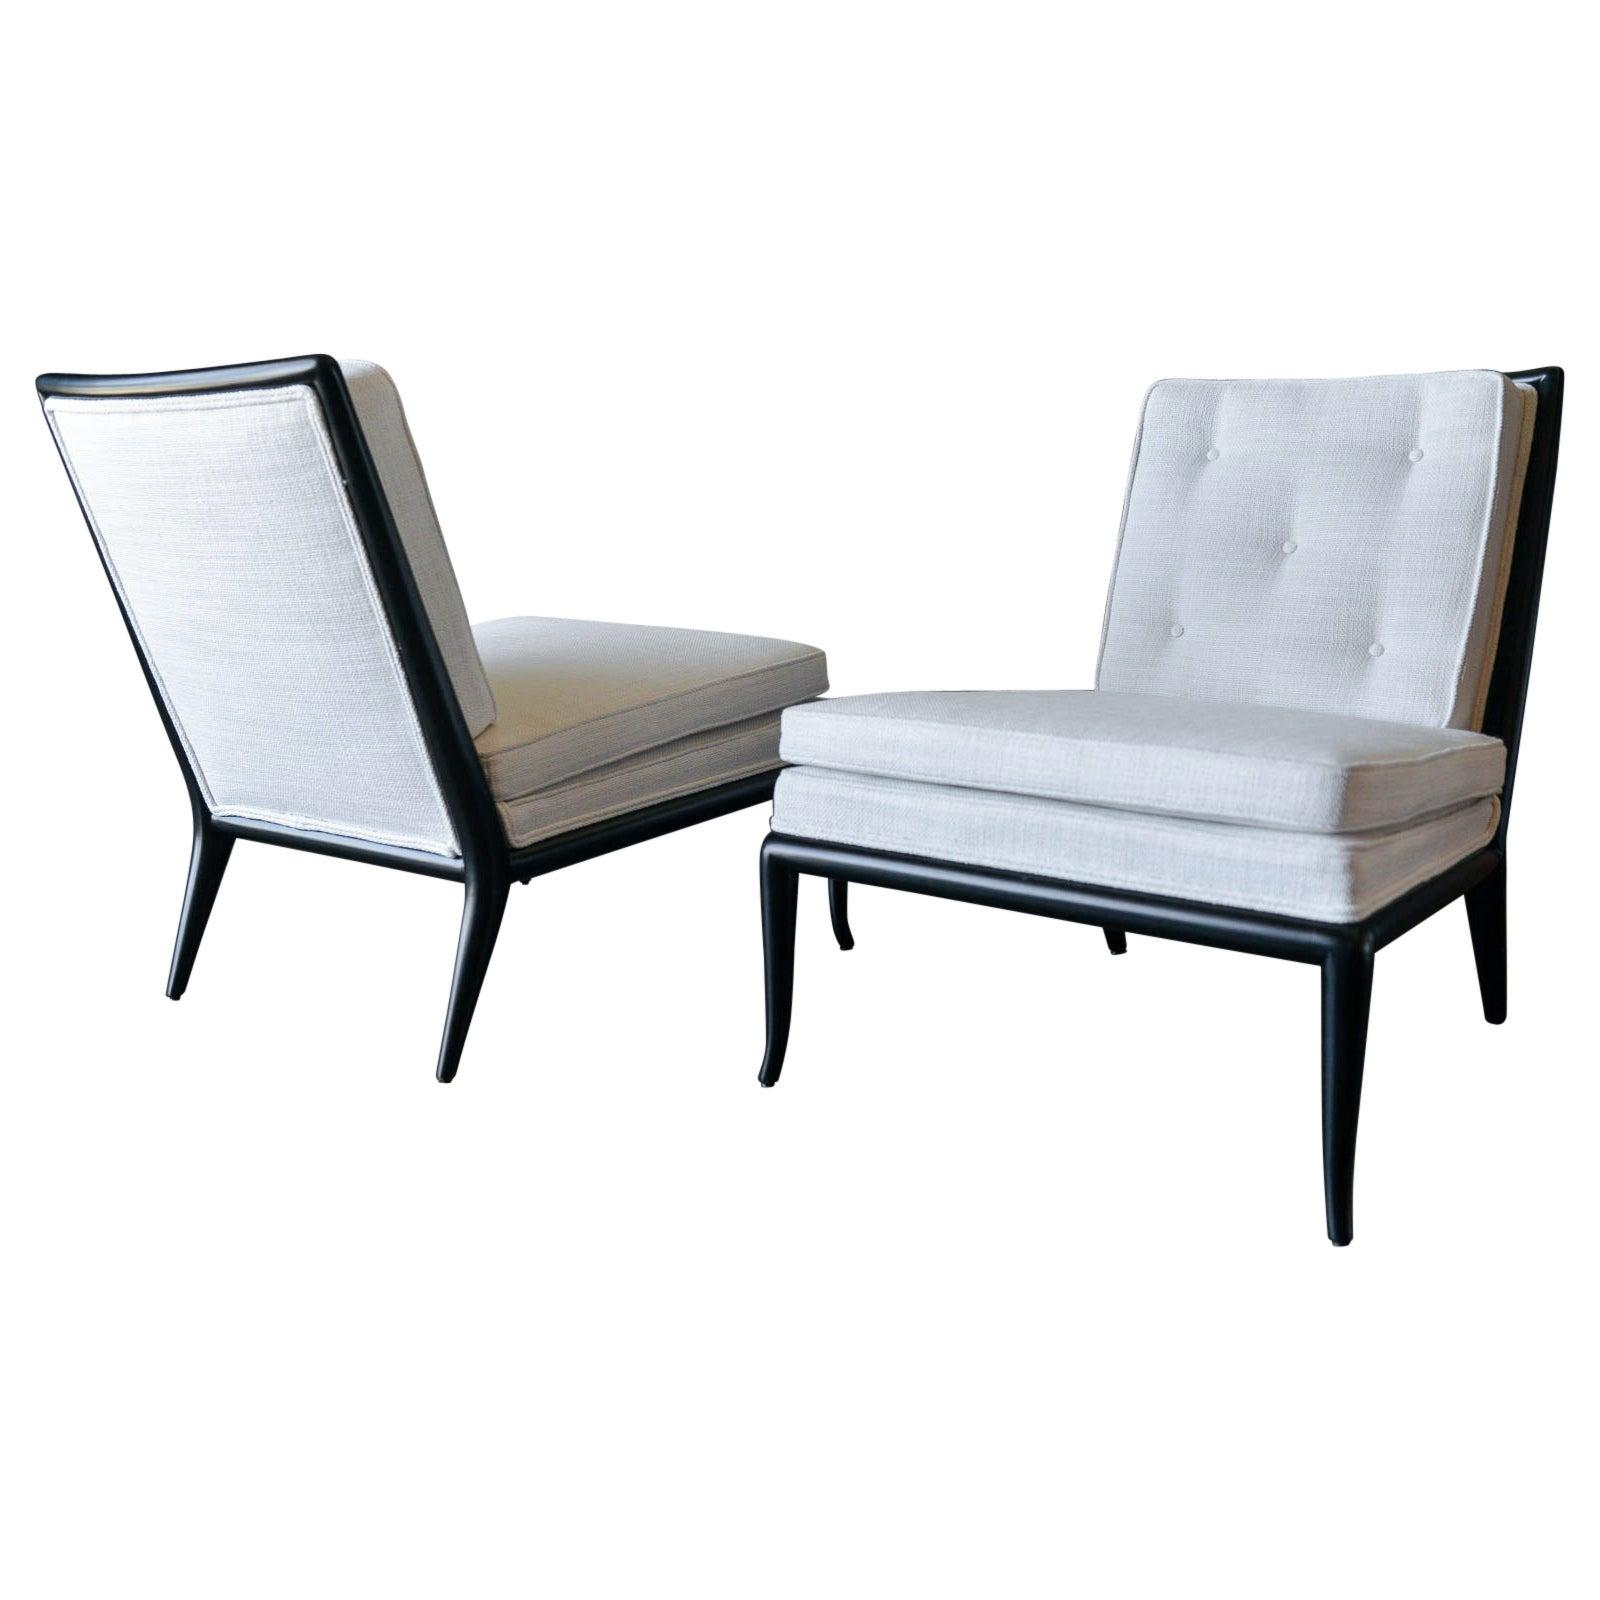 Pair of T.H. Robsjohn-Gibbings Slipper Chairs, Model WMB, 1955